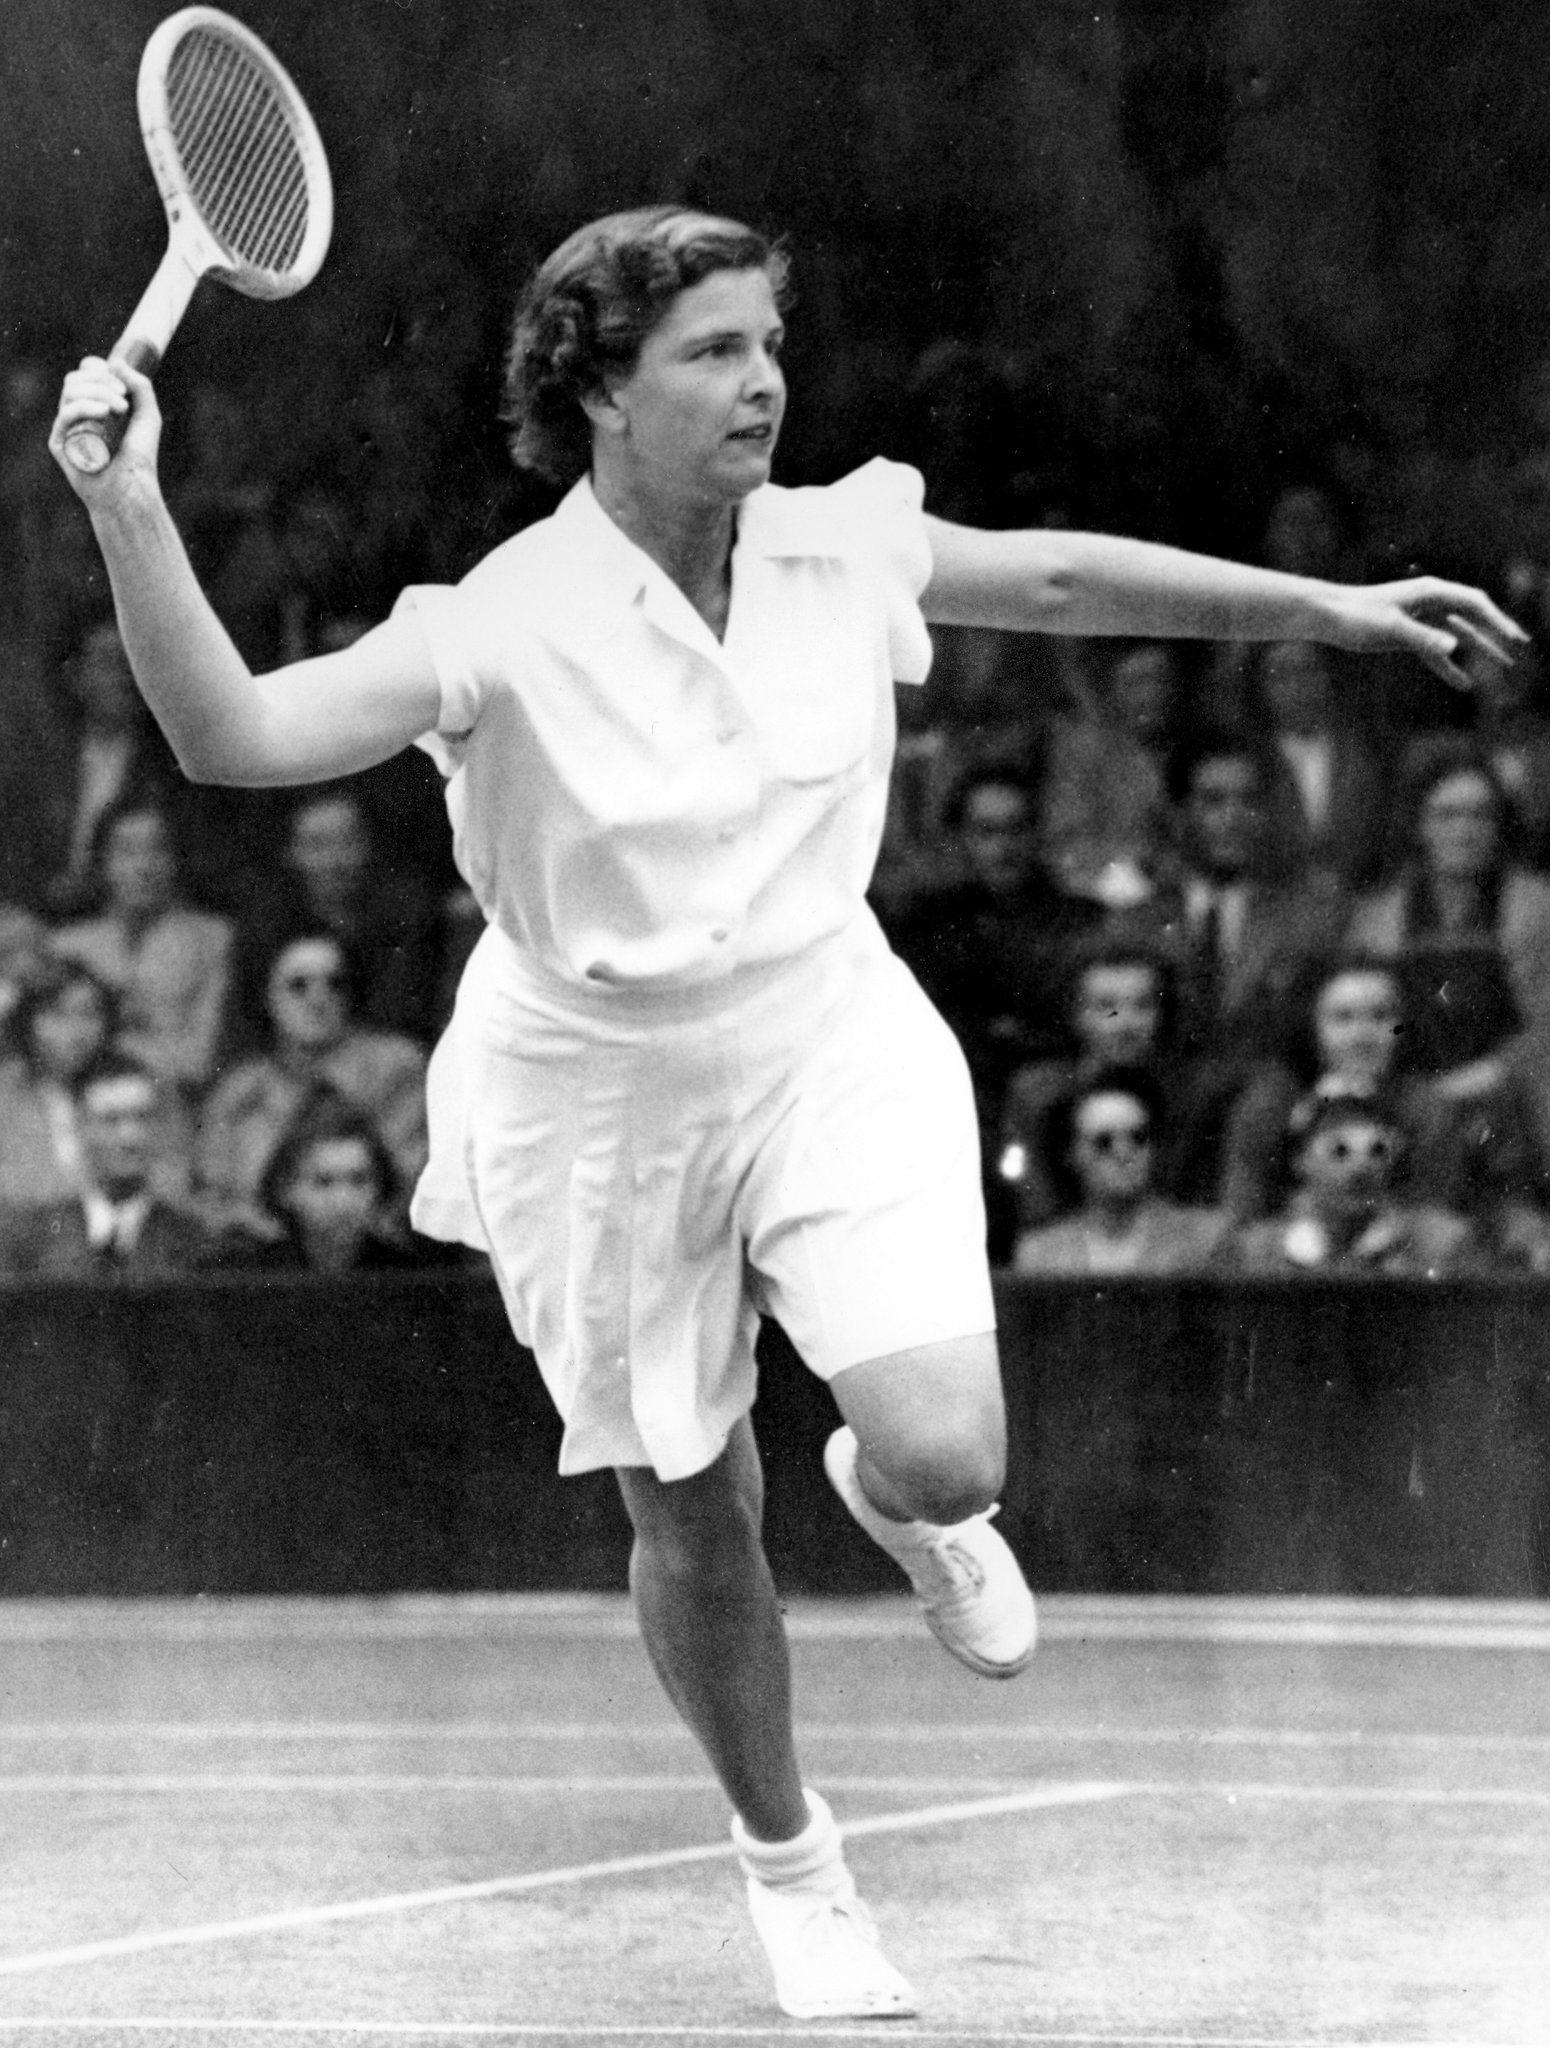 Margaret Osborne duPont 94 Tennis Champion Dies